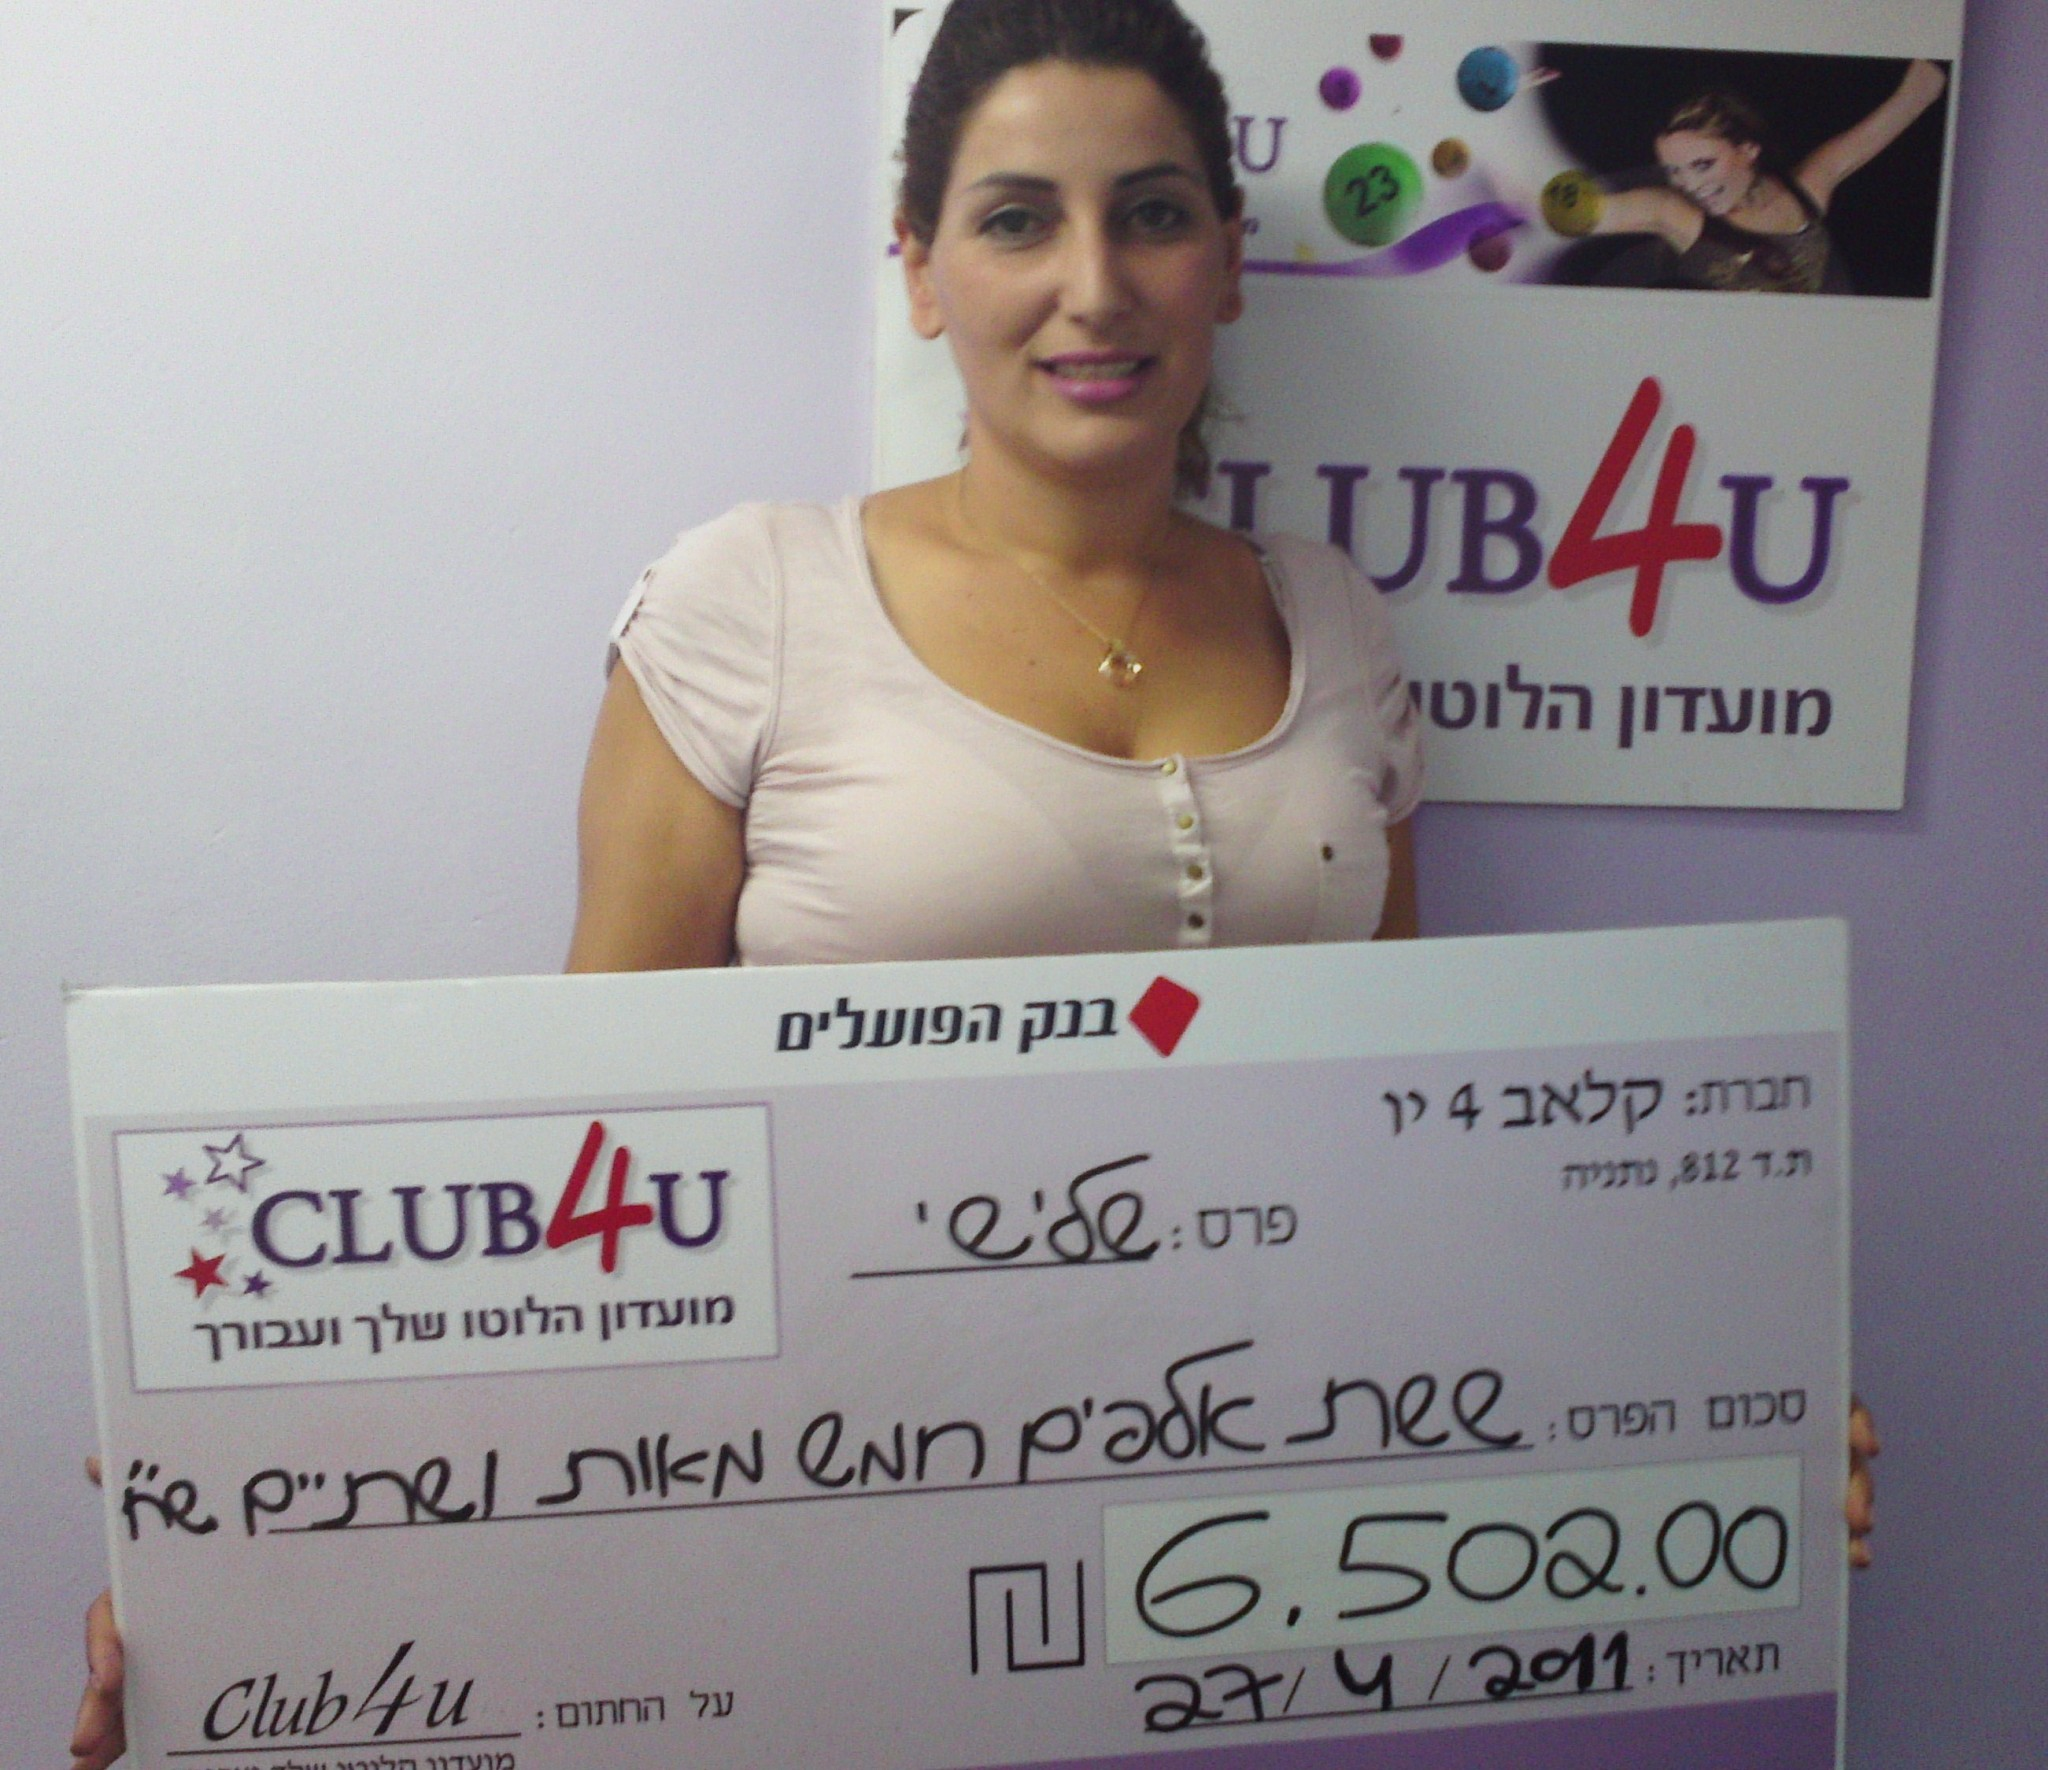 CLUB4U - זכייה בפרס